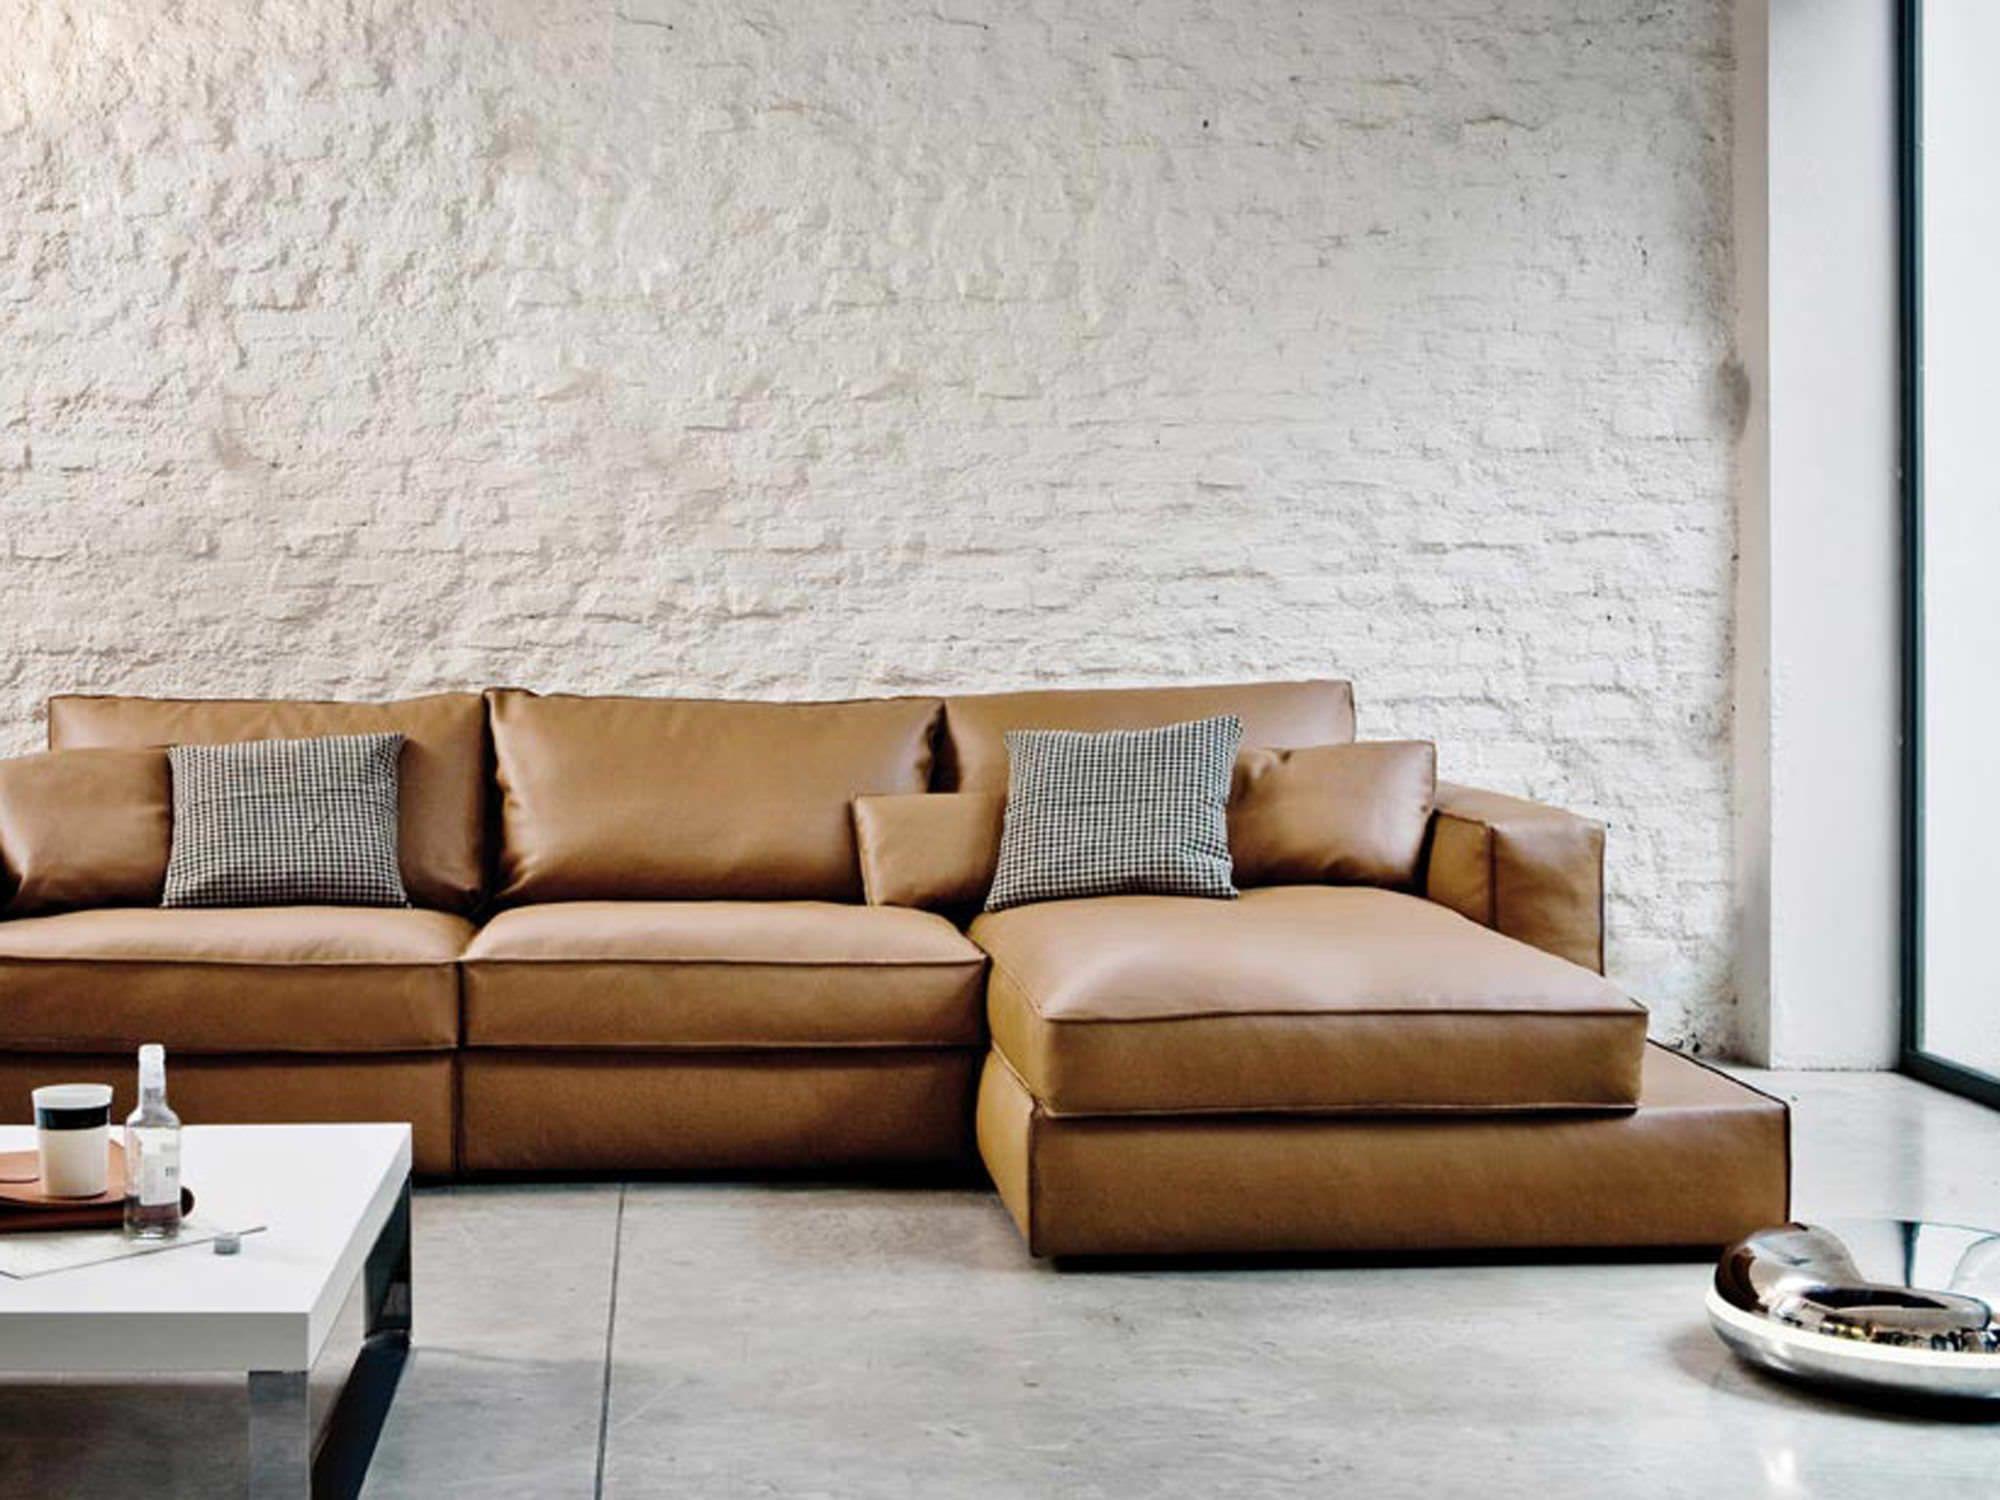 Modular Sofa Bed Leather Sofa Sofa Design Brown Sofa